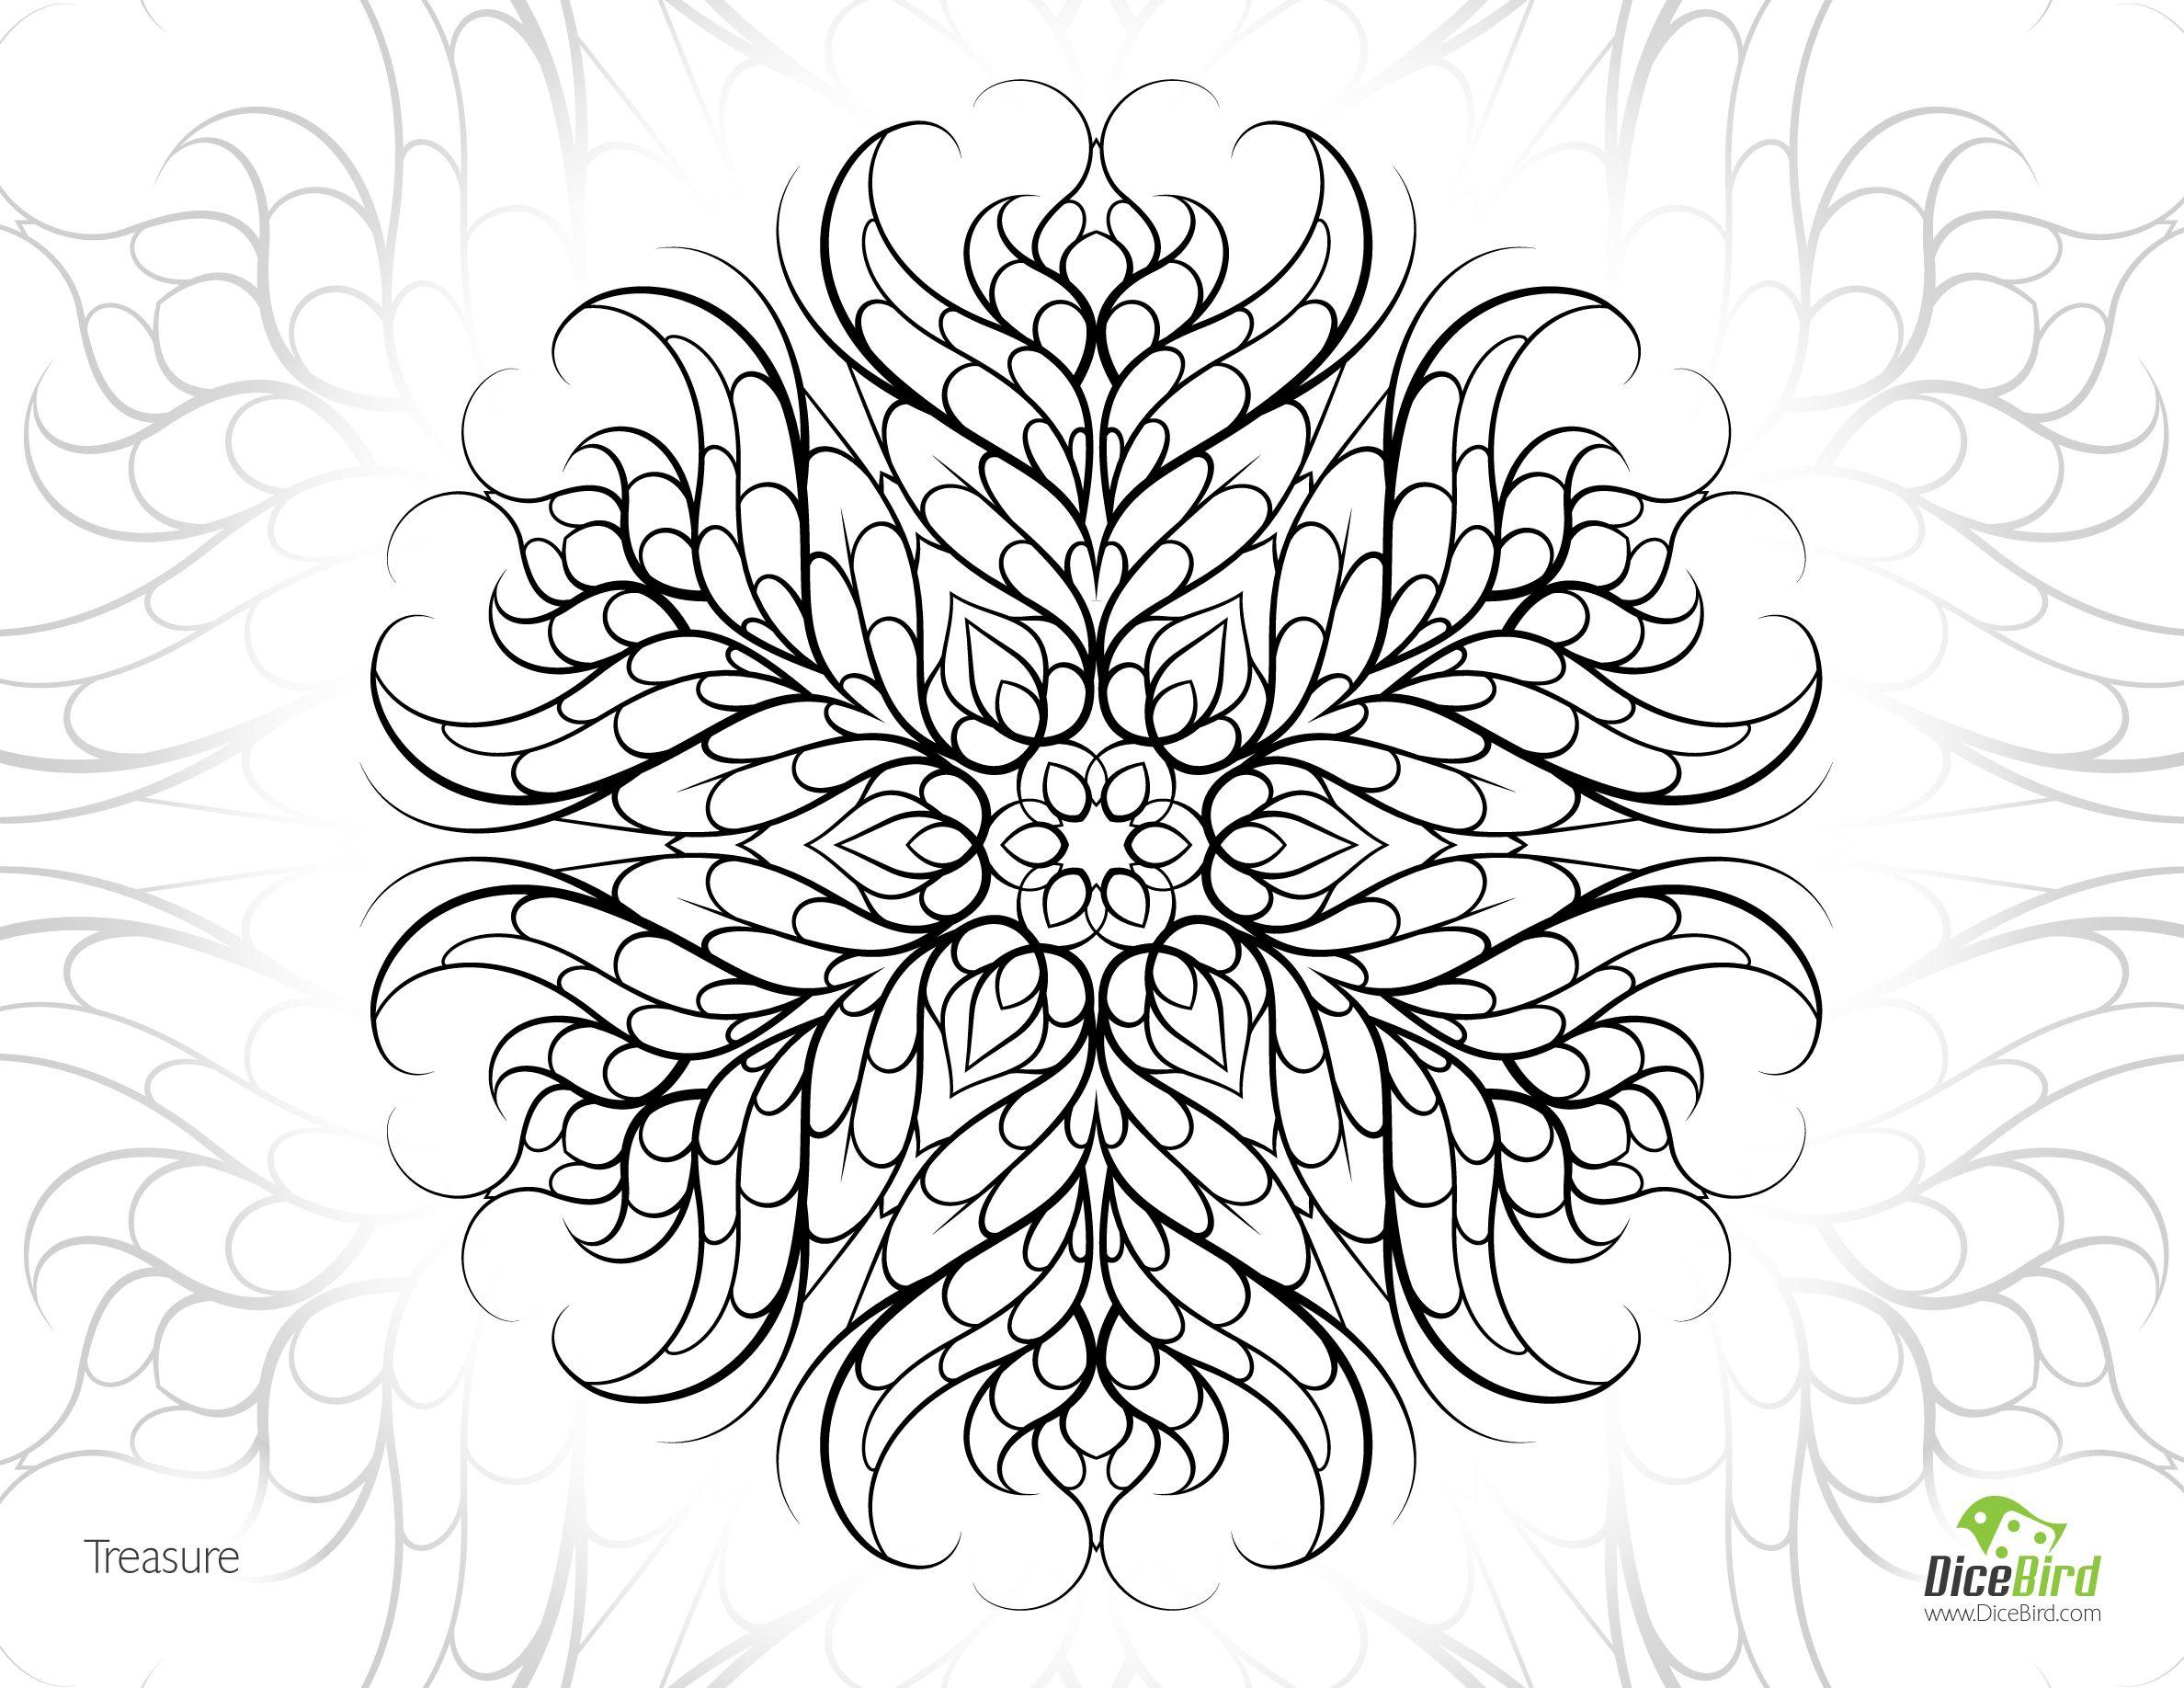 Treasure free adult printable mandala adult colouring page Mental